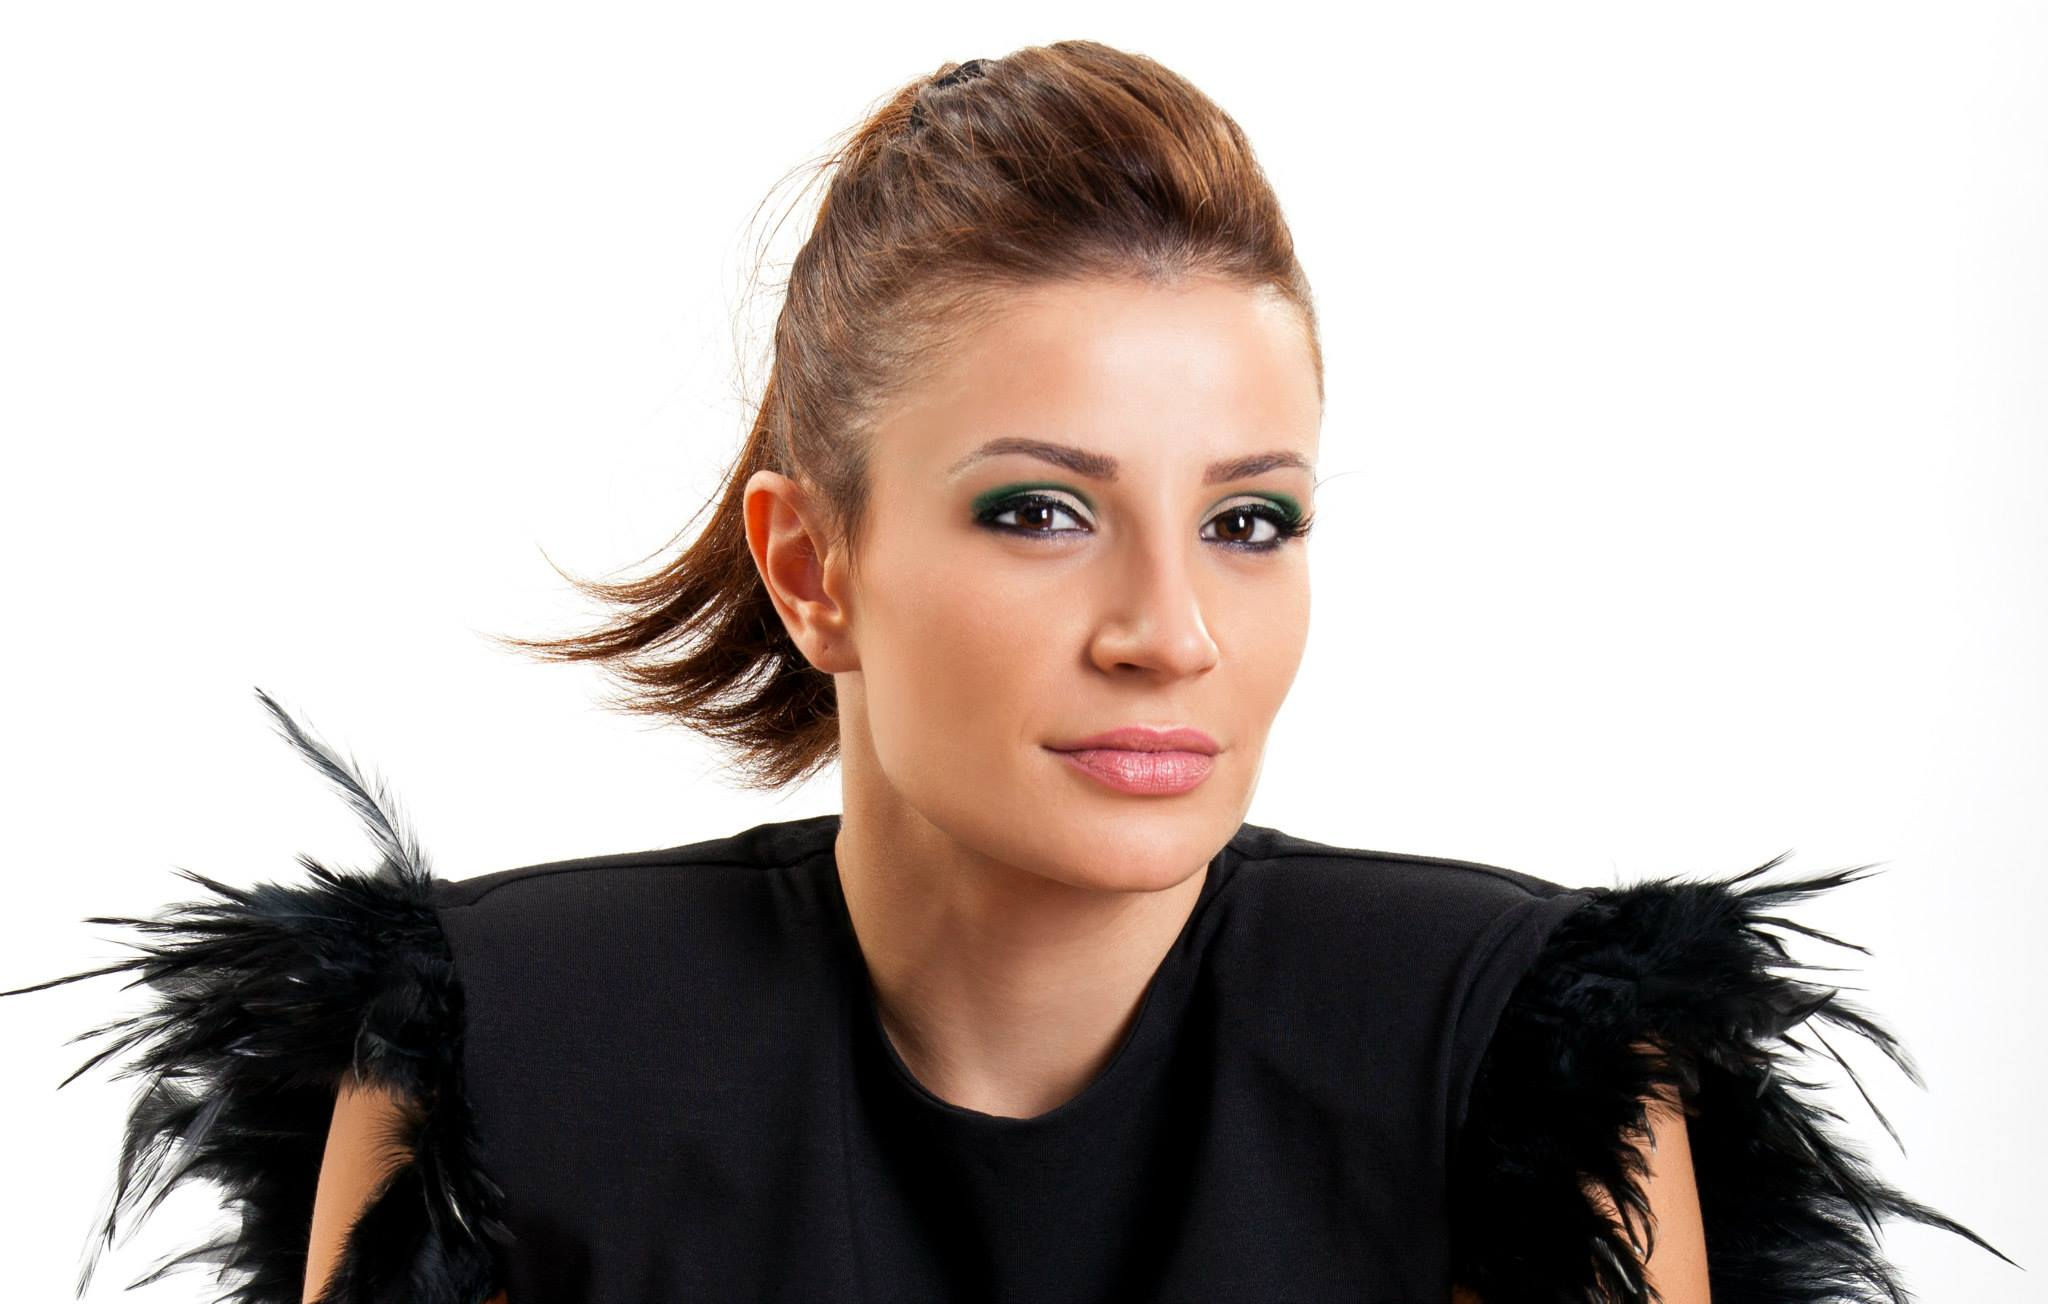 Daca, inainte, arata ca o tocilara, Anca Melinte este, acum, o femeie foarte frumoasa